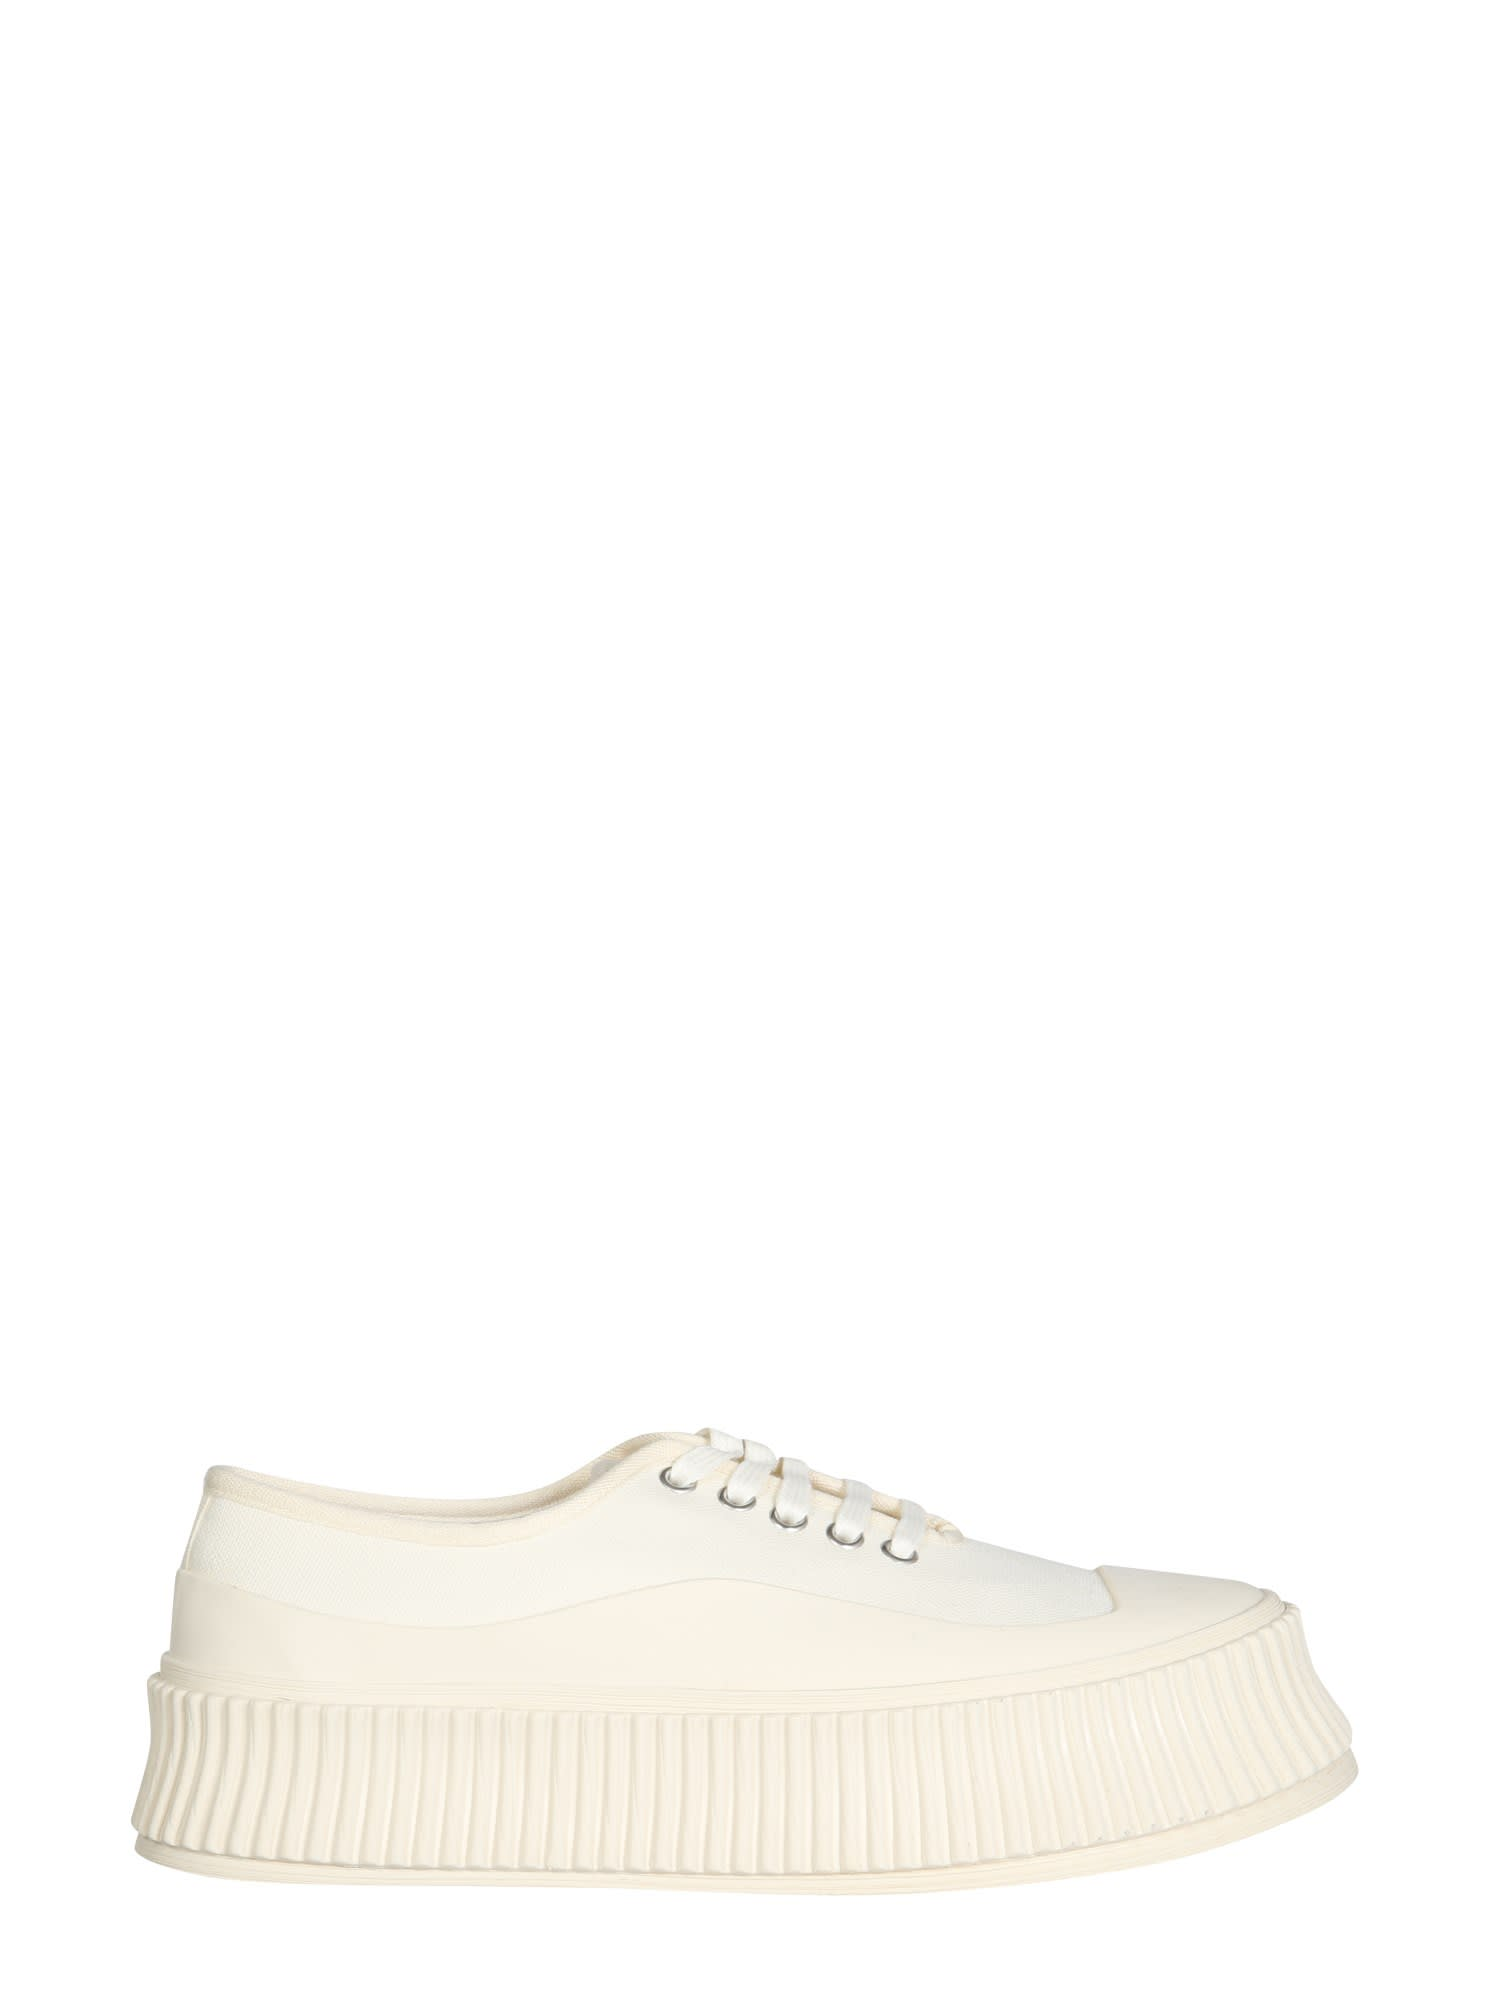 Buy Jil Sander Low Sneakers online, shop Jil Sander shoes with free shipping